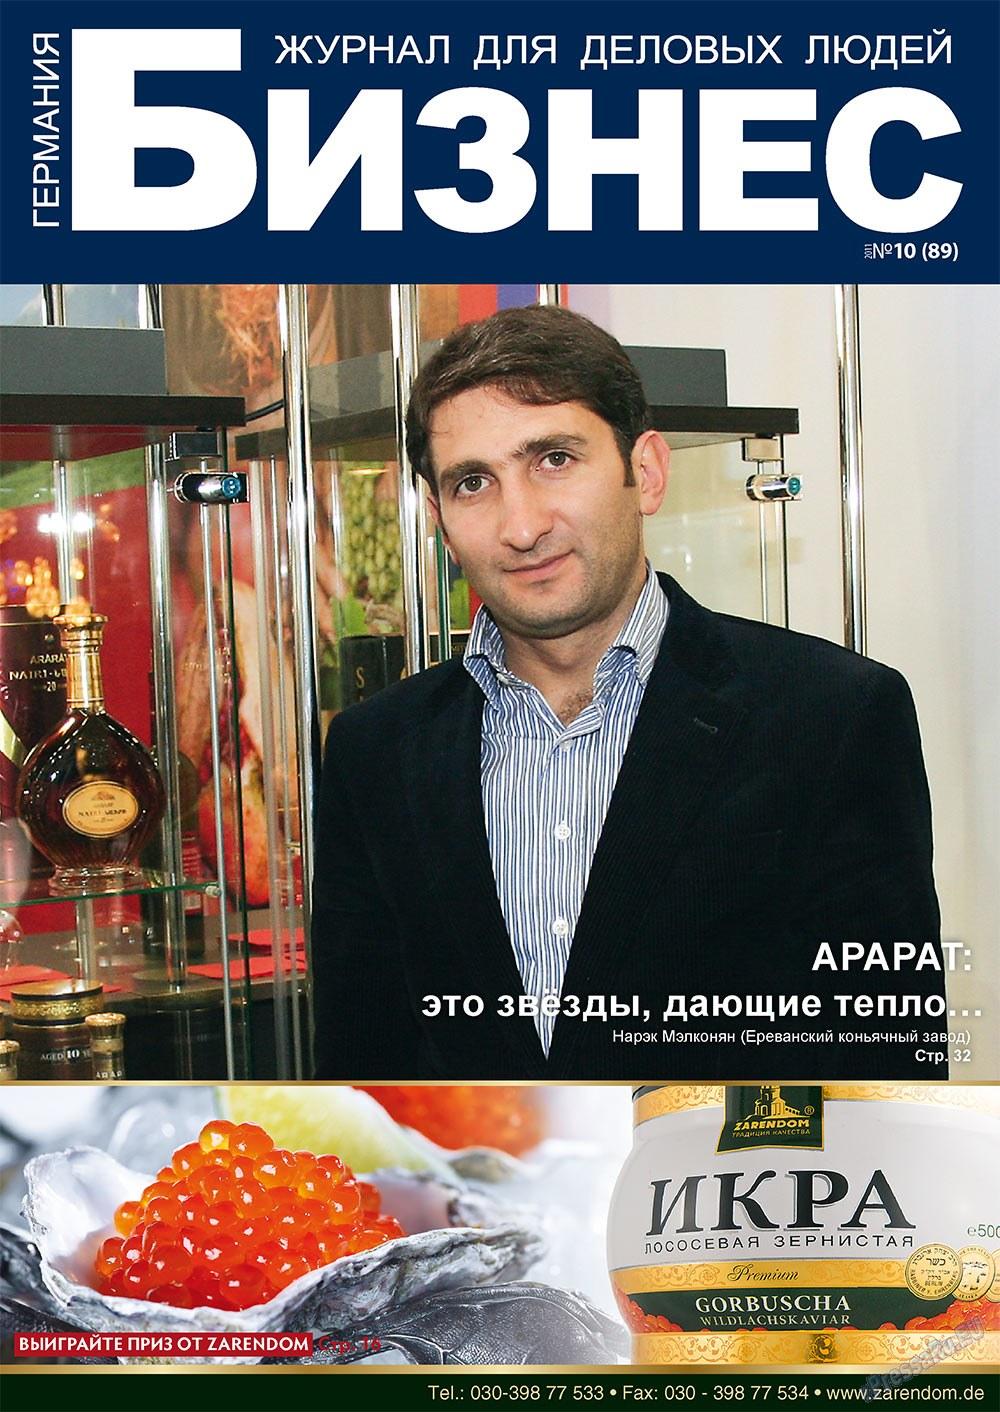 Бизнес (журнал). 2011 год, номер 10, стр. 1